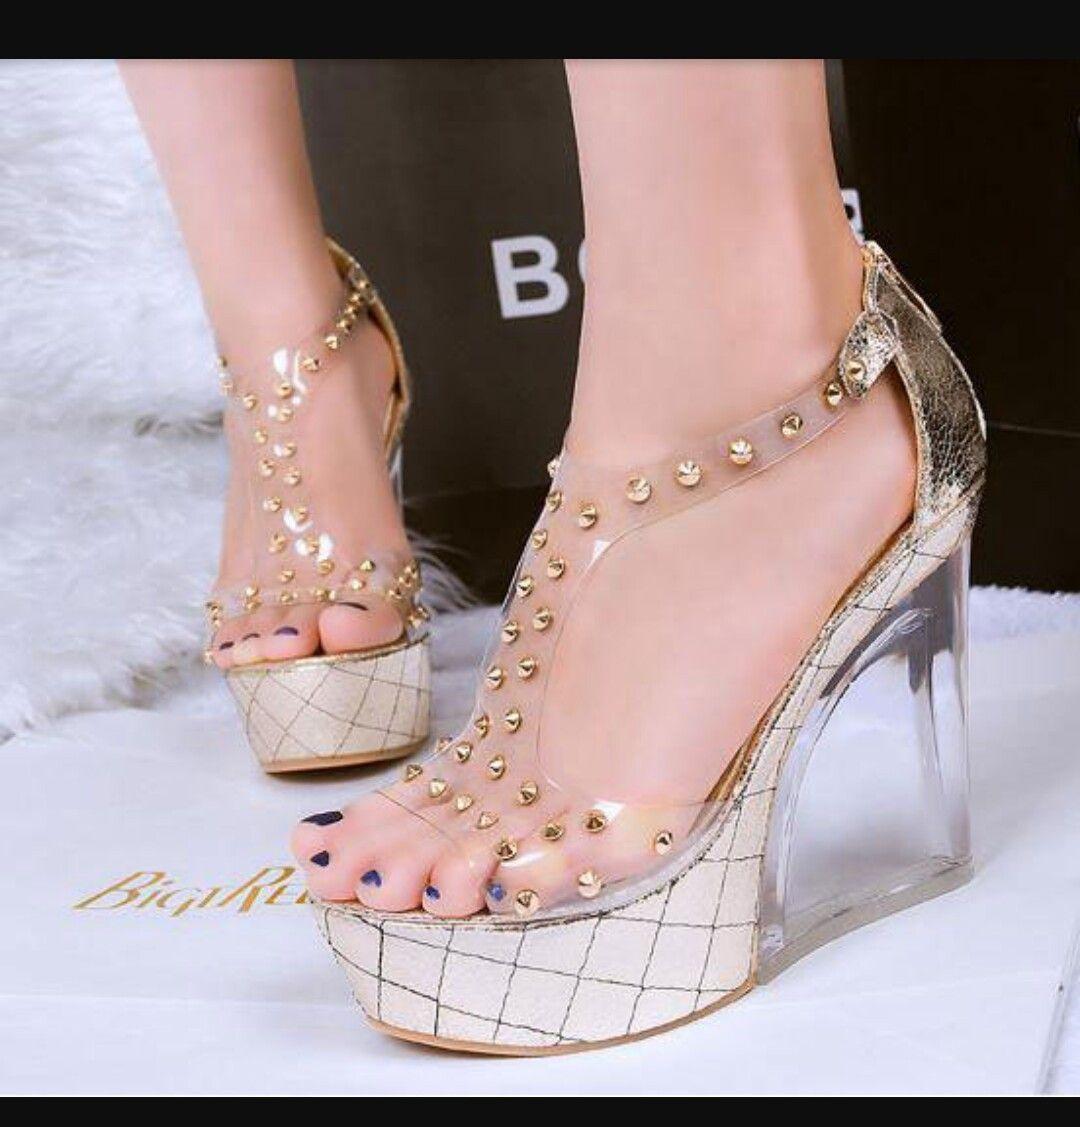 Pin de Angela Adriana en shoes | Pinterest